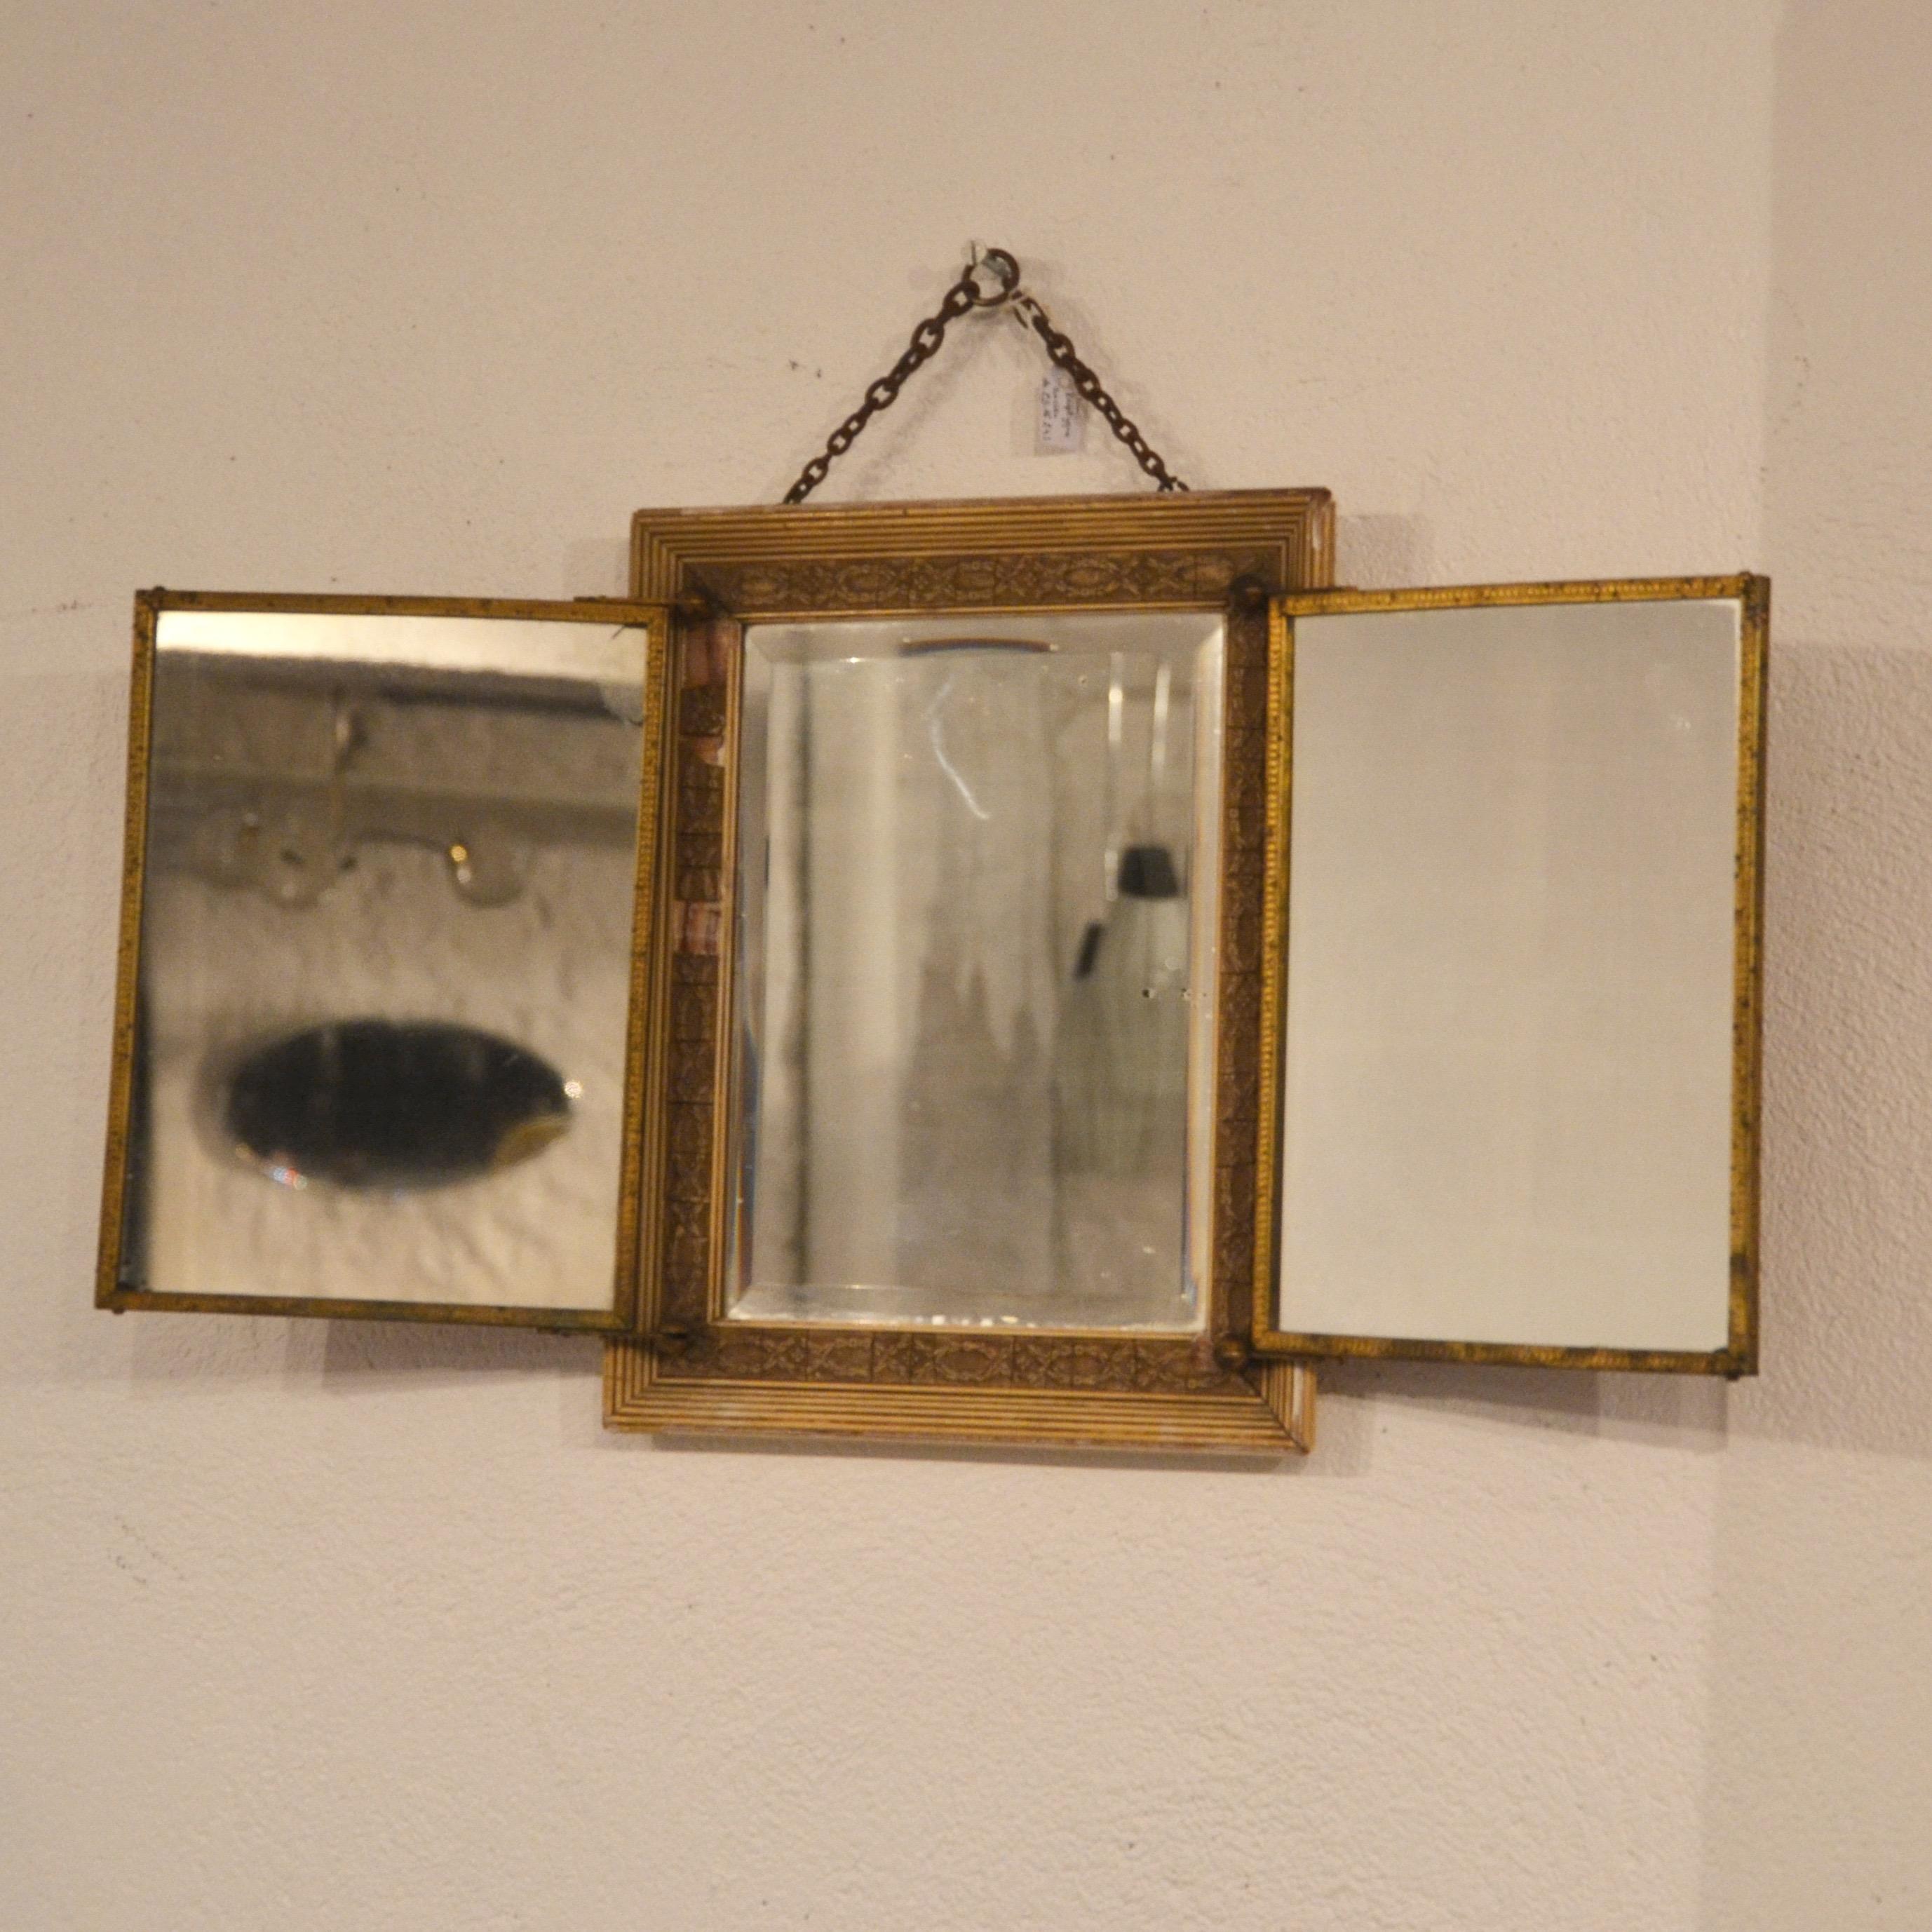 miroir triptyque ancien bindiesbindies. Black Bedroom Furniture Sets. Home Design Ideas